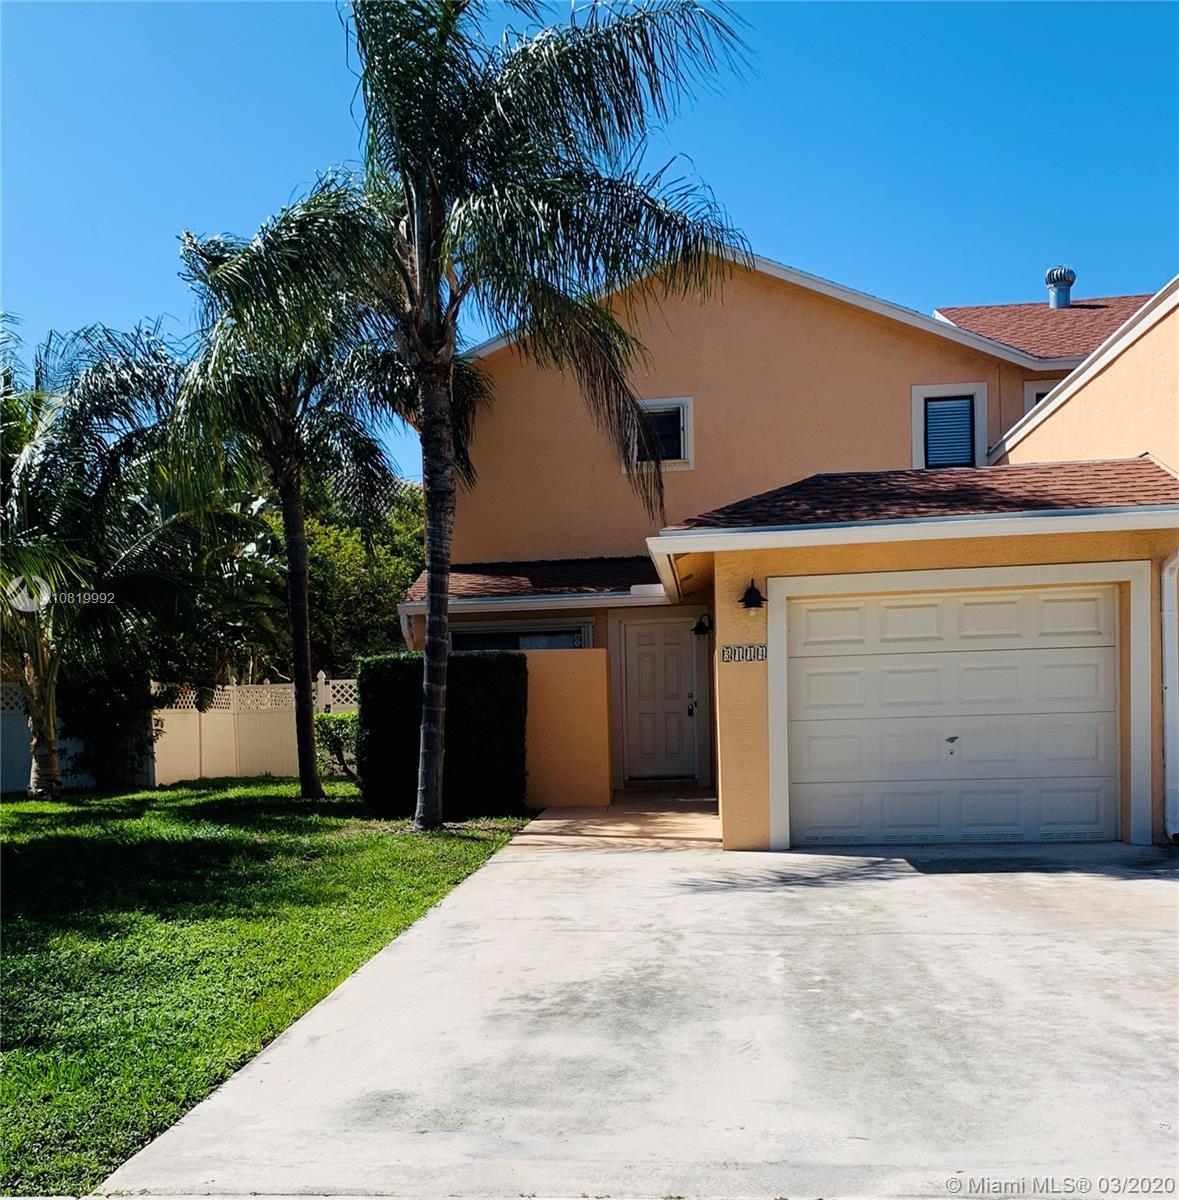 3114 Spanish Trl, Delray Beach, FL 33483 - Delray Beach, FL real estate listing